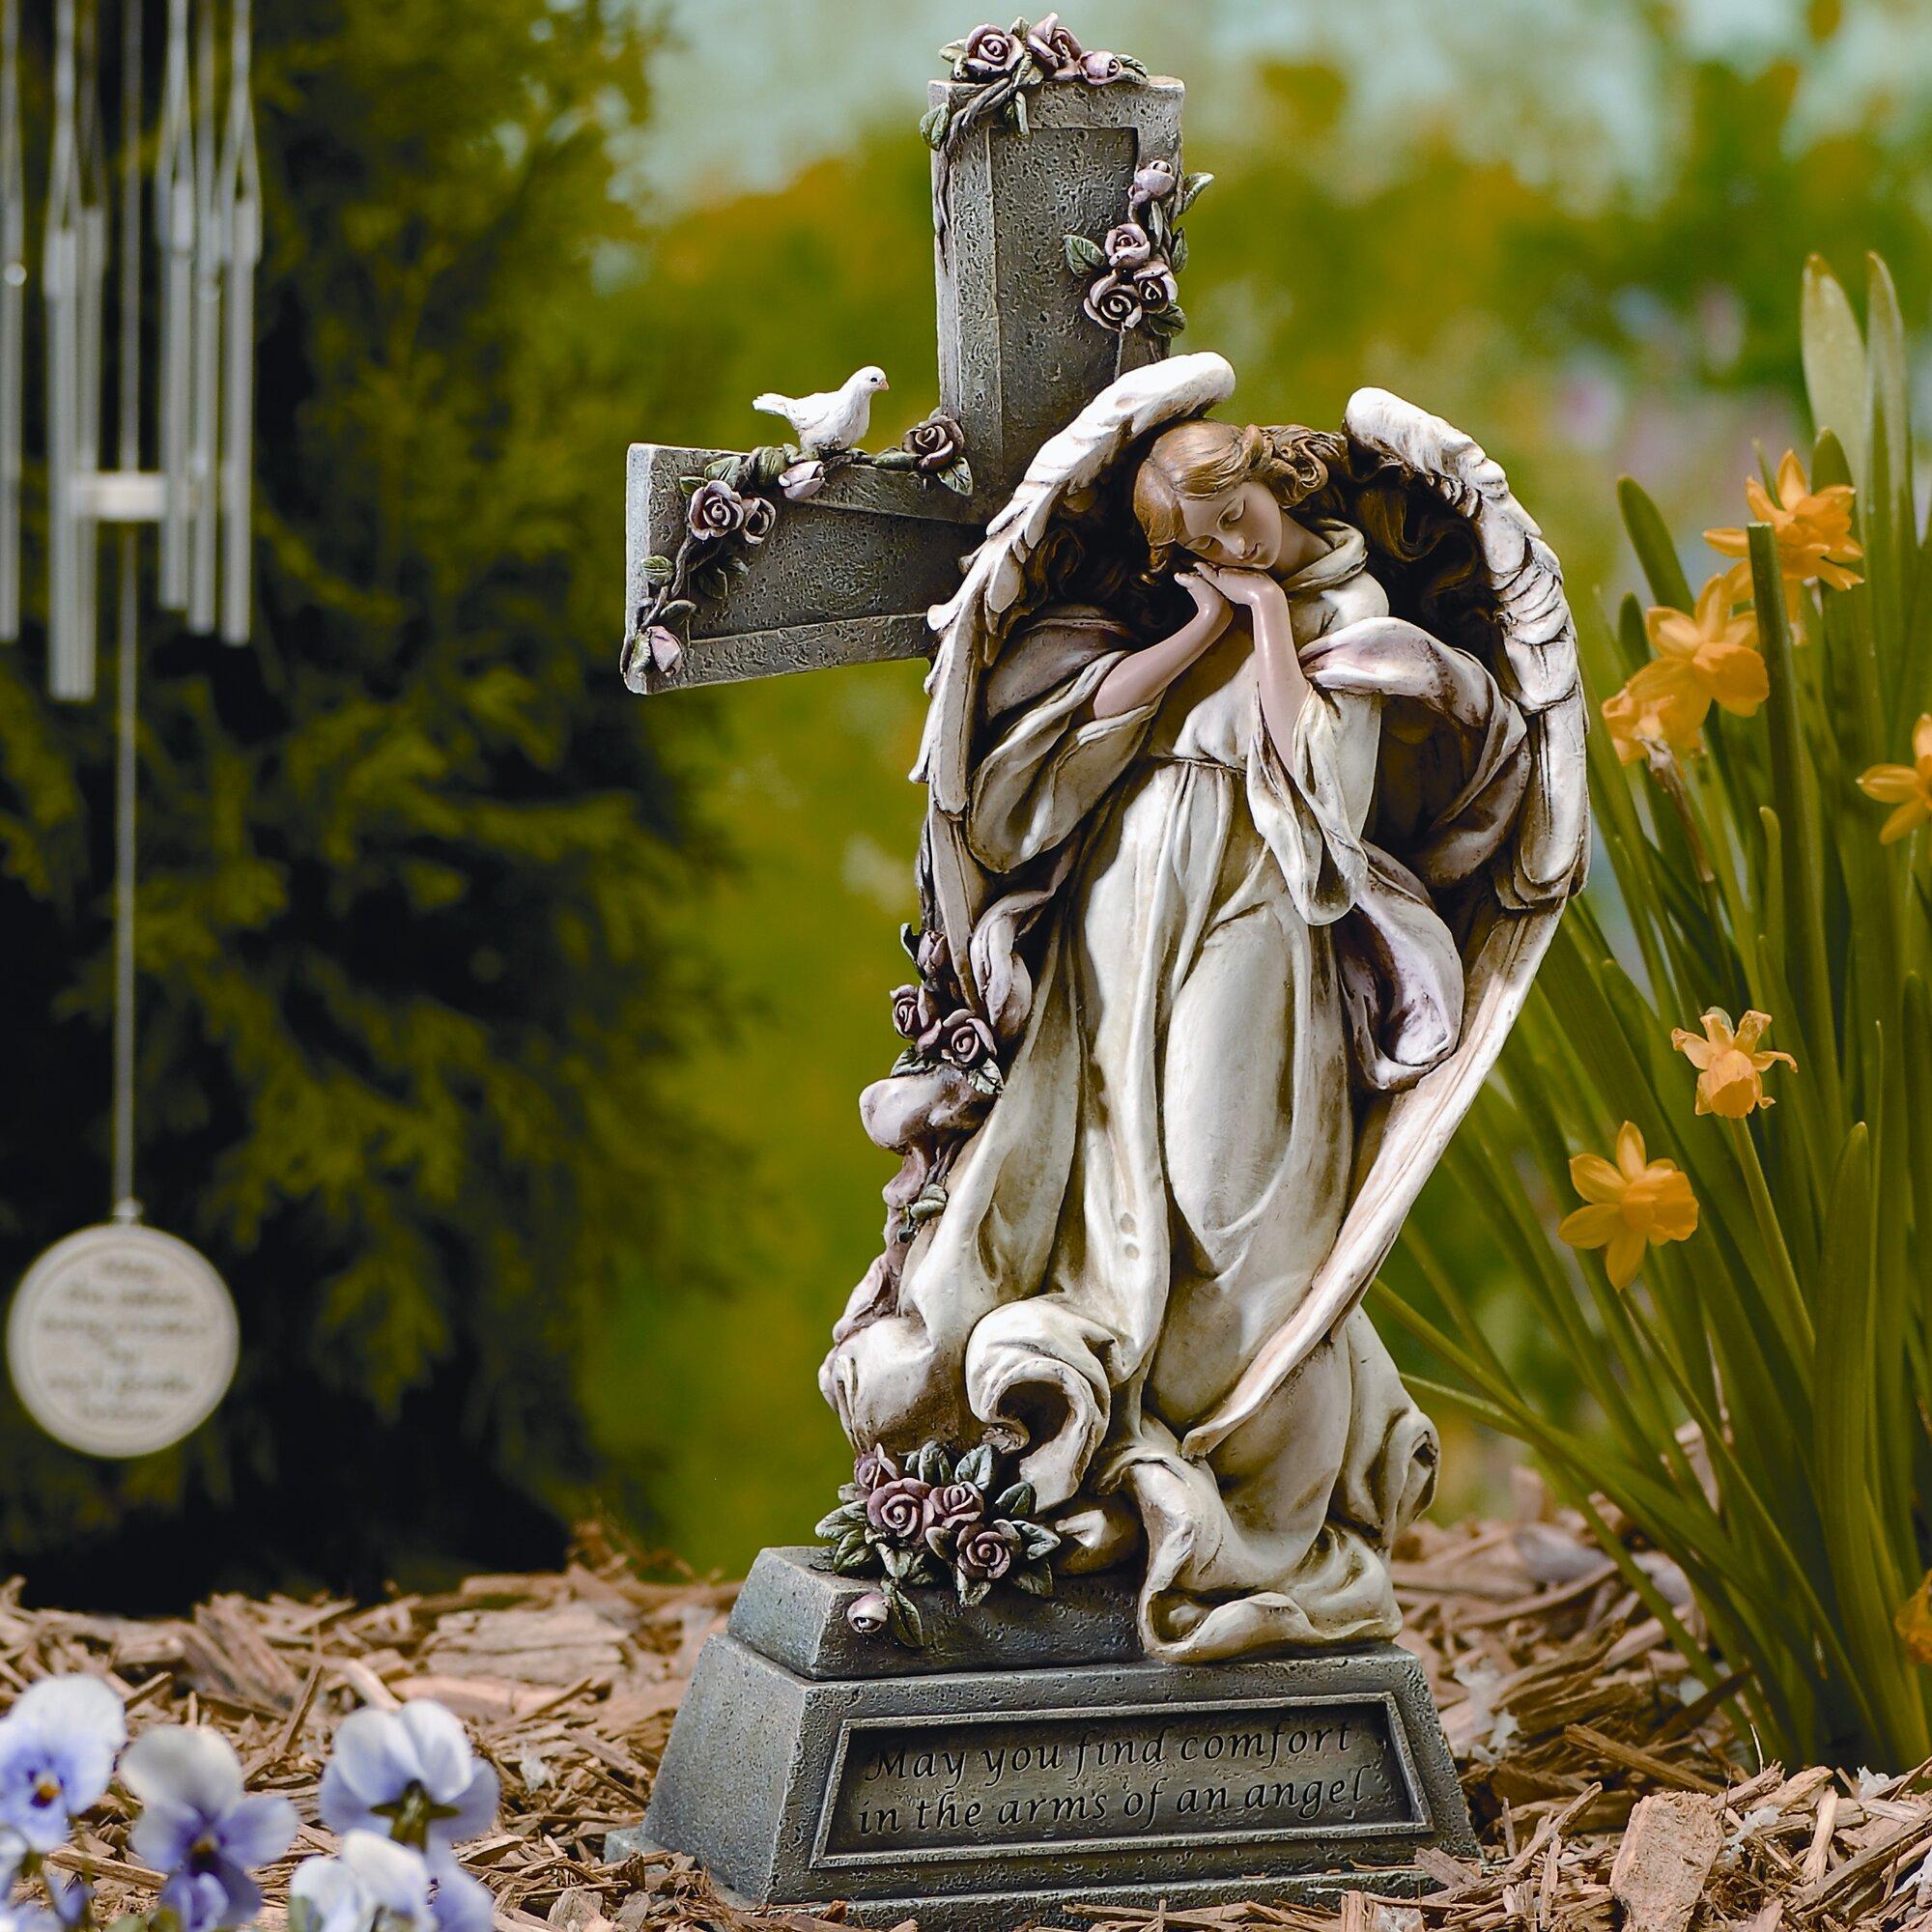 Roman inc garden angel with cross statue reviews wayfair - Exterior church crosses for sale ...